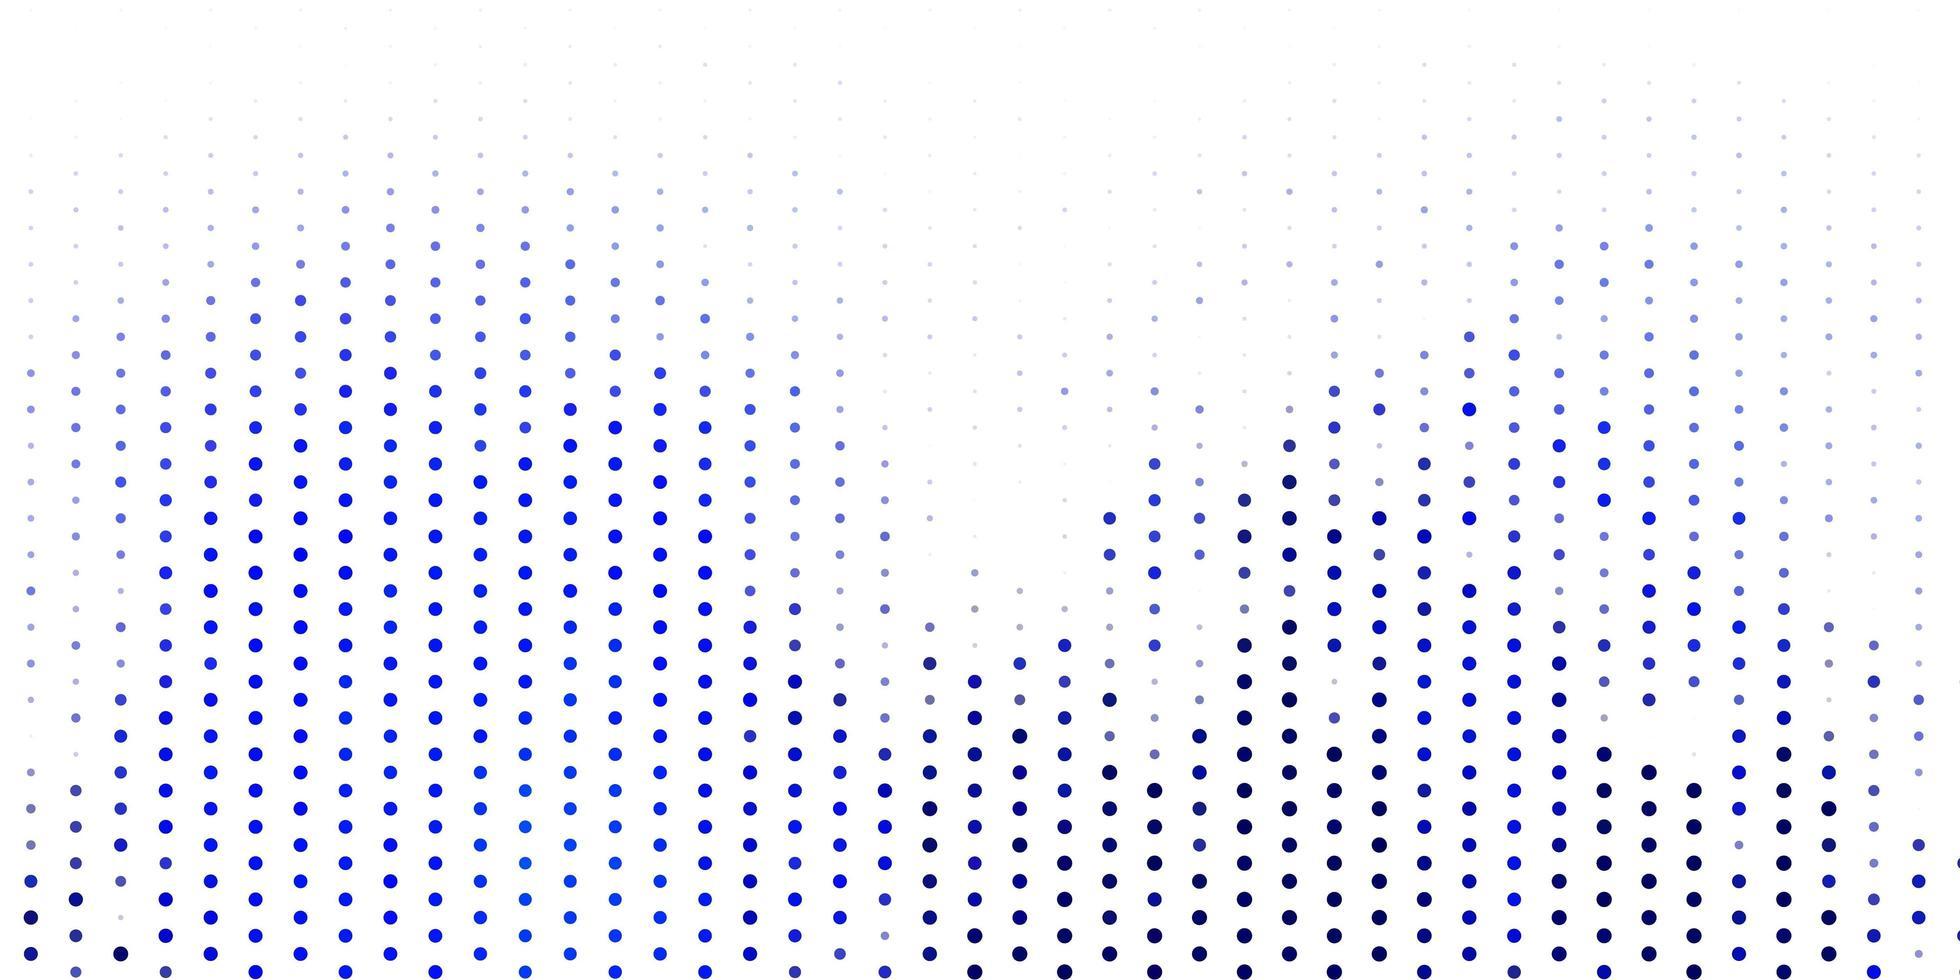 hellblaues Vektorlayout mit Kreisformen. vektor